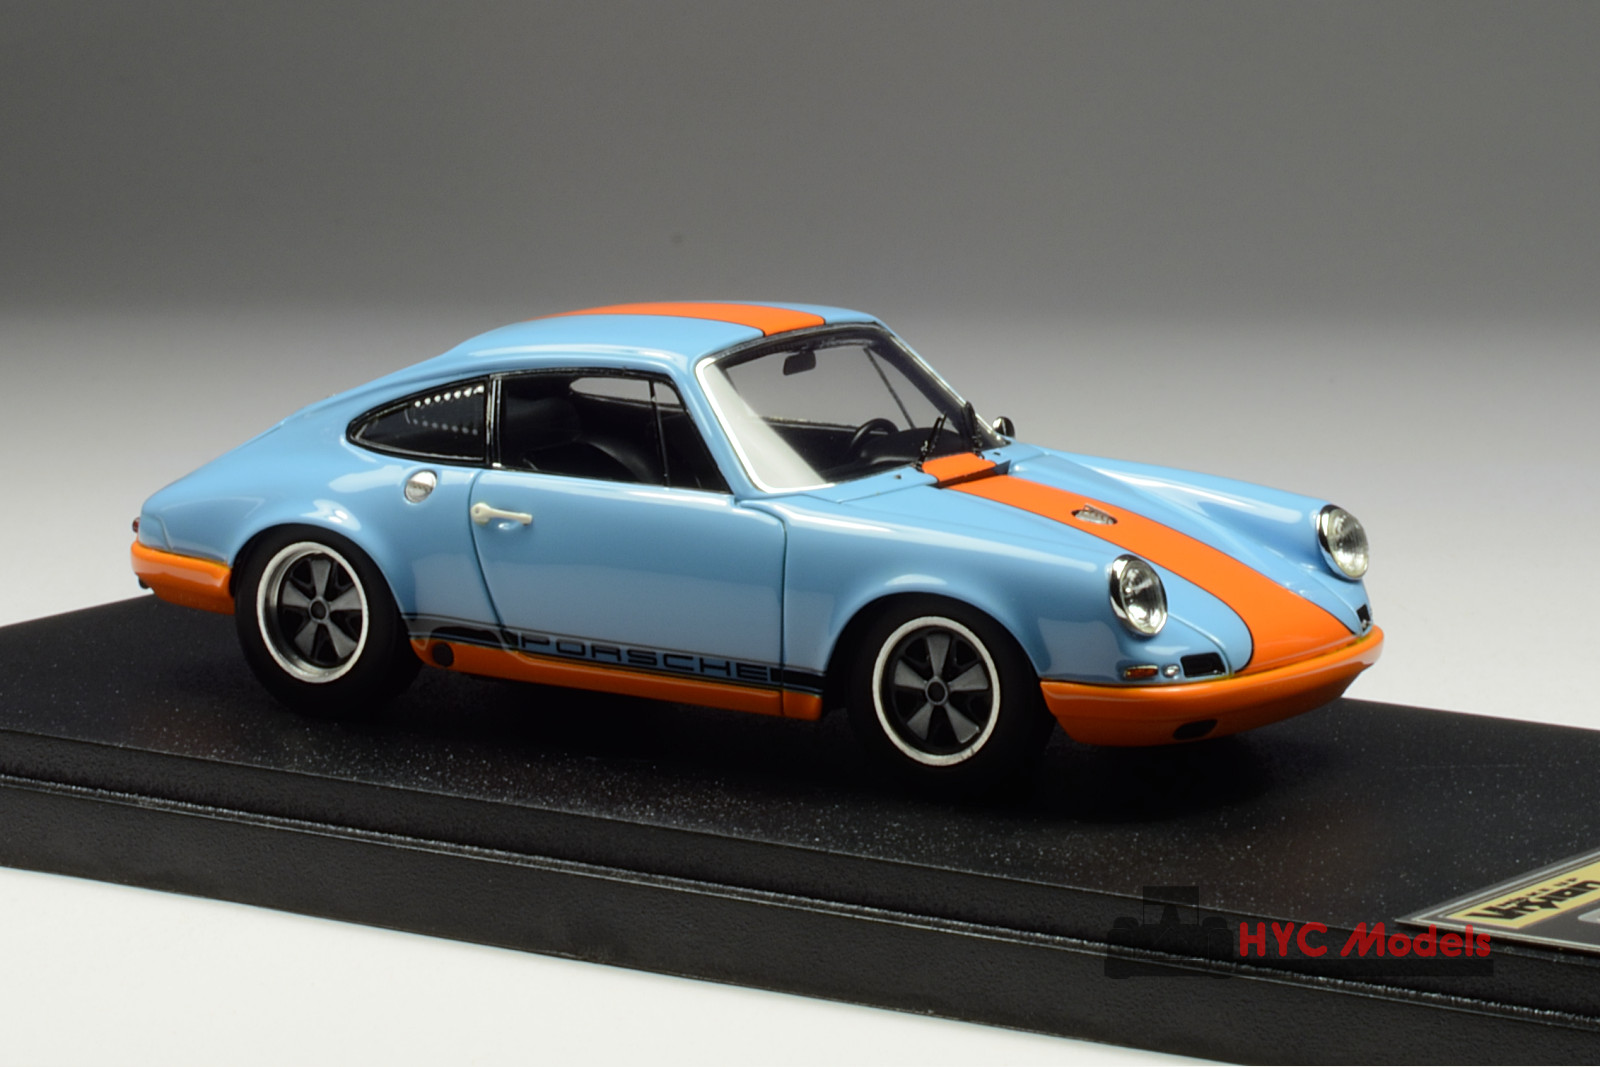 Vision Vm044f 1 43 Porsche 911r 1967 Gulf Blue Hyc Models